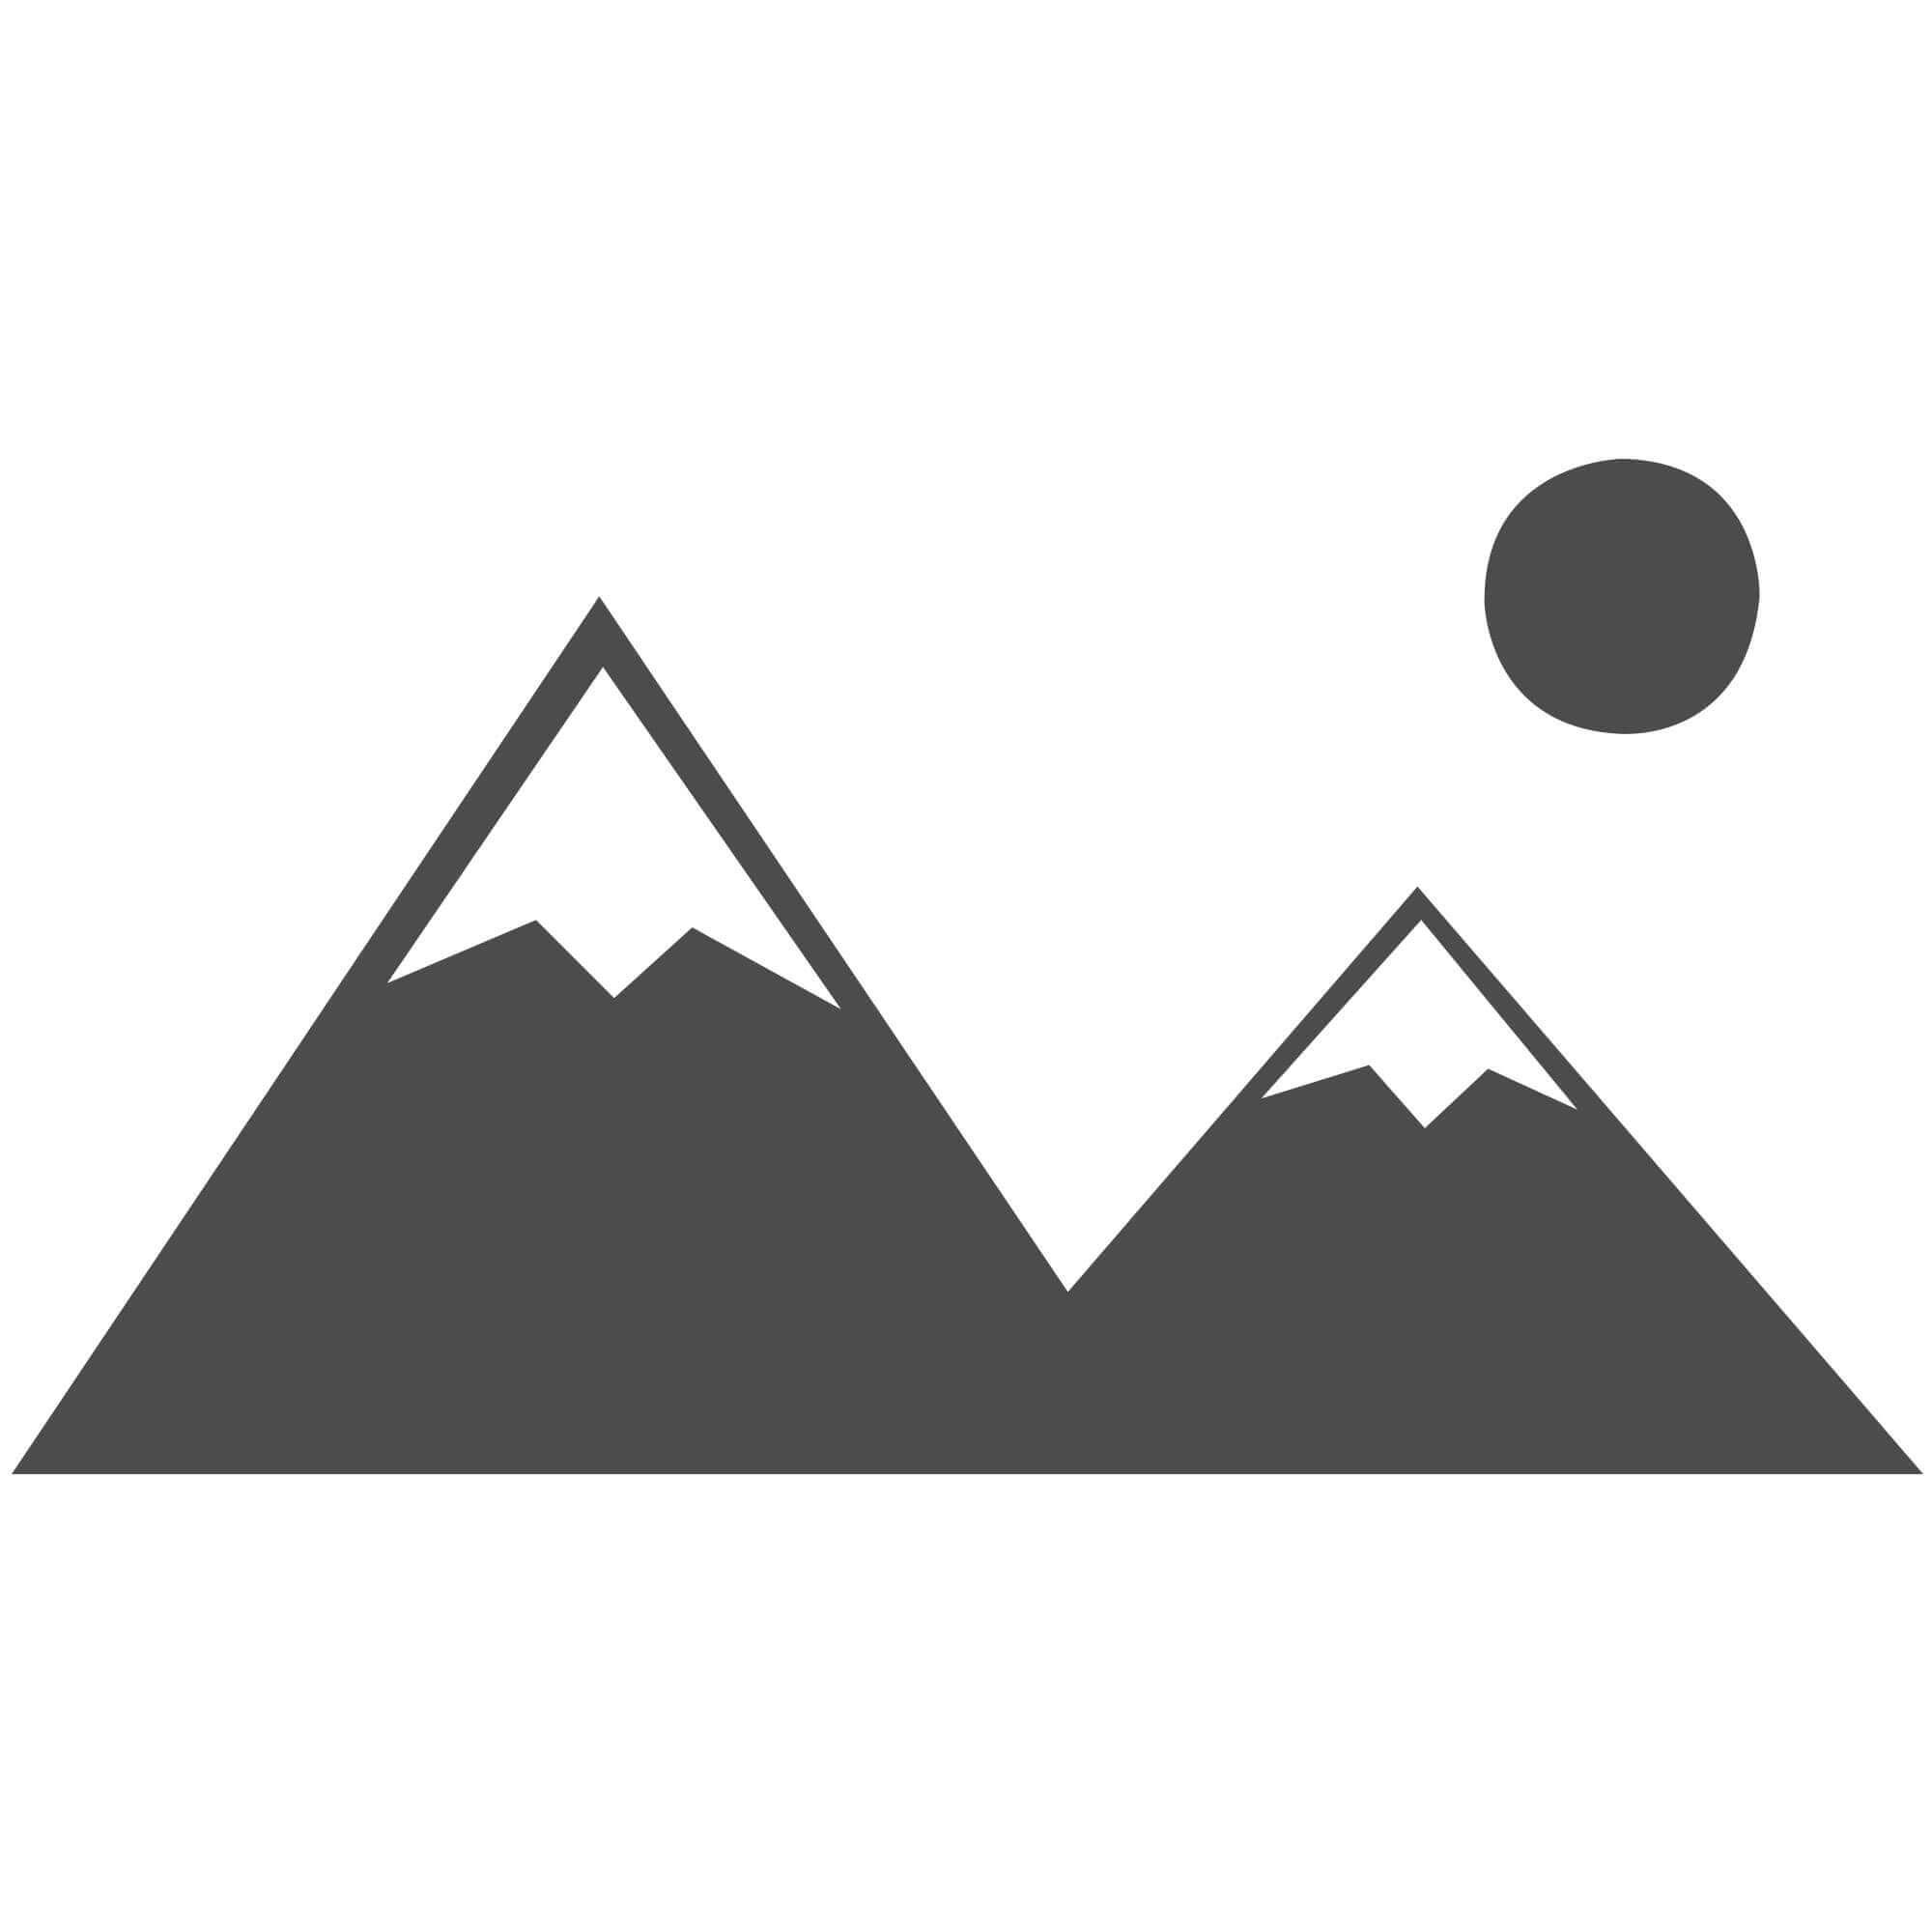 "Alhambra Traditional Rug - 6345c ivory/beige - Size 133 x 195 cm (4'4"" x 6'5"")"